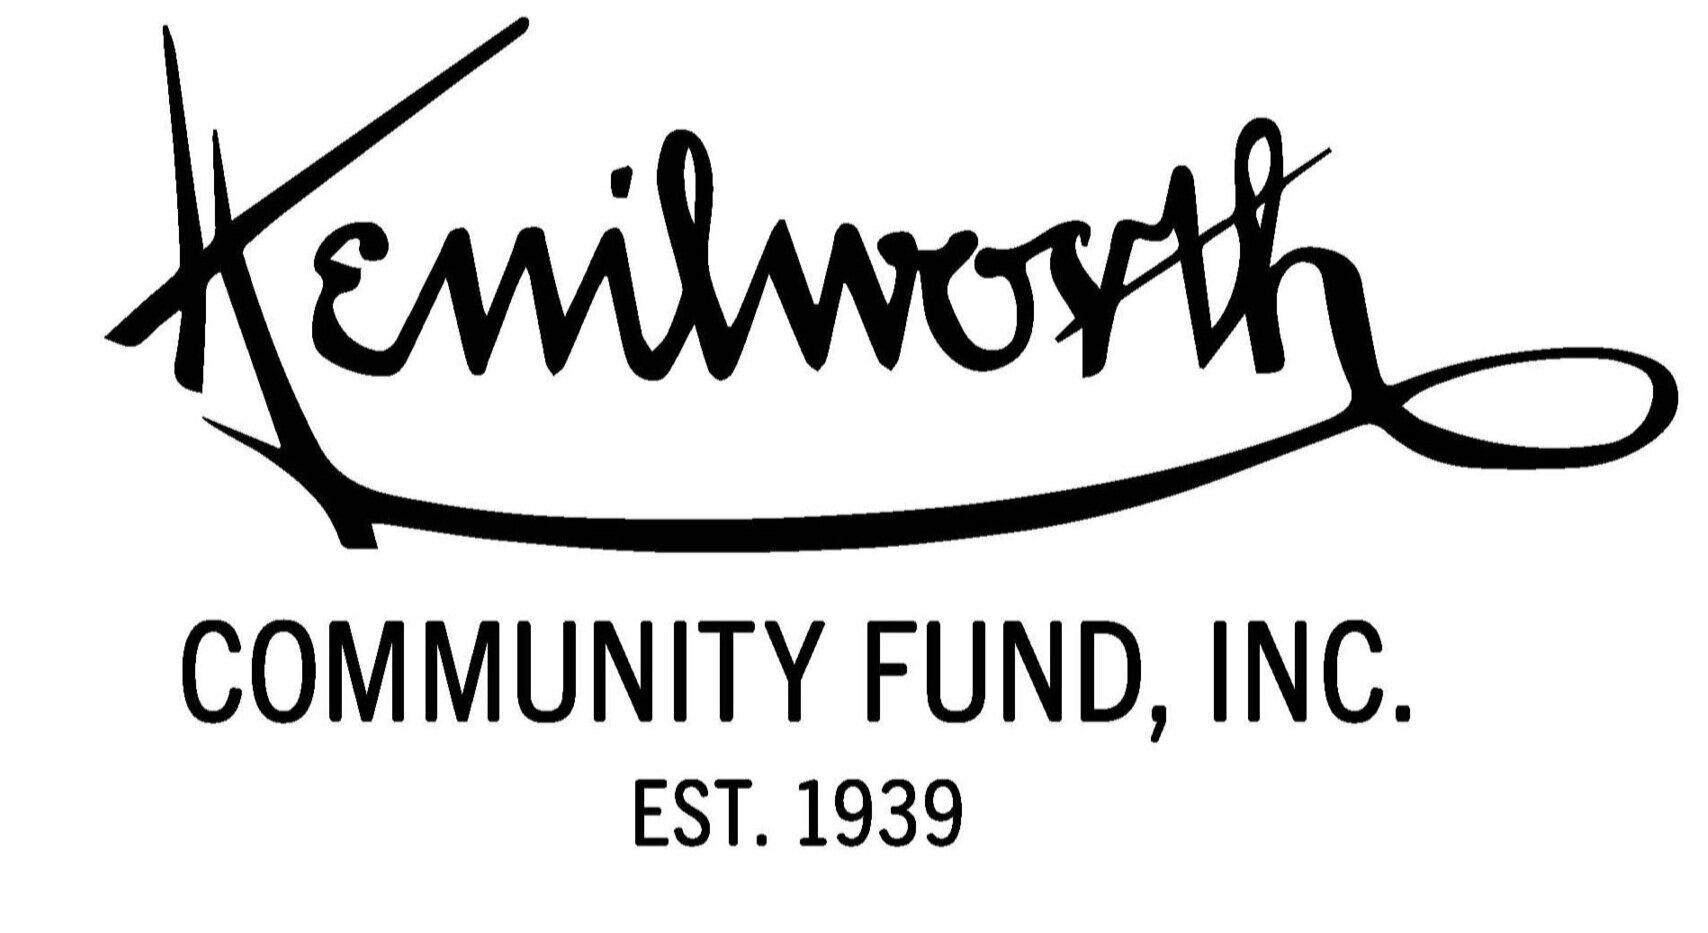 kenilworth%252BCommunity%252BFund%252BInc.%252BEst%252B1939.jpg